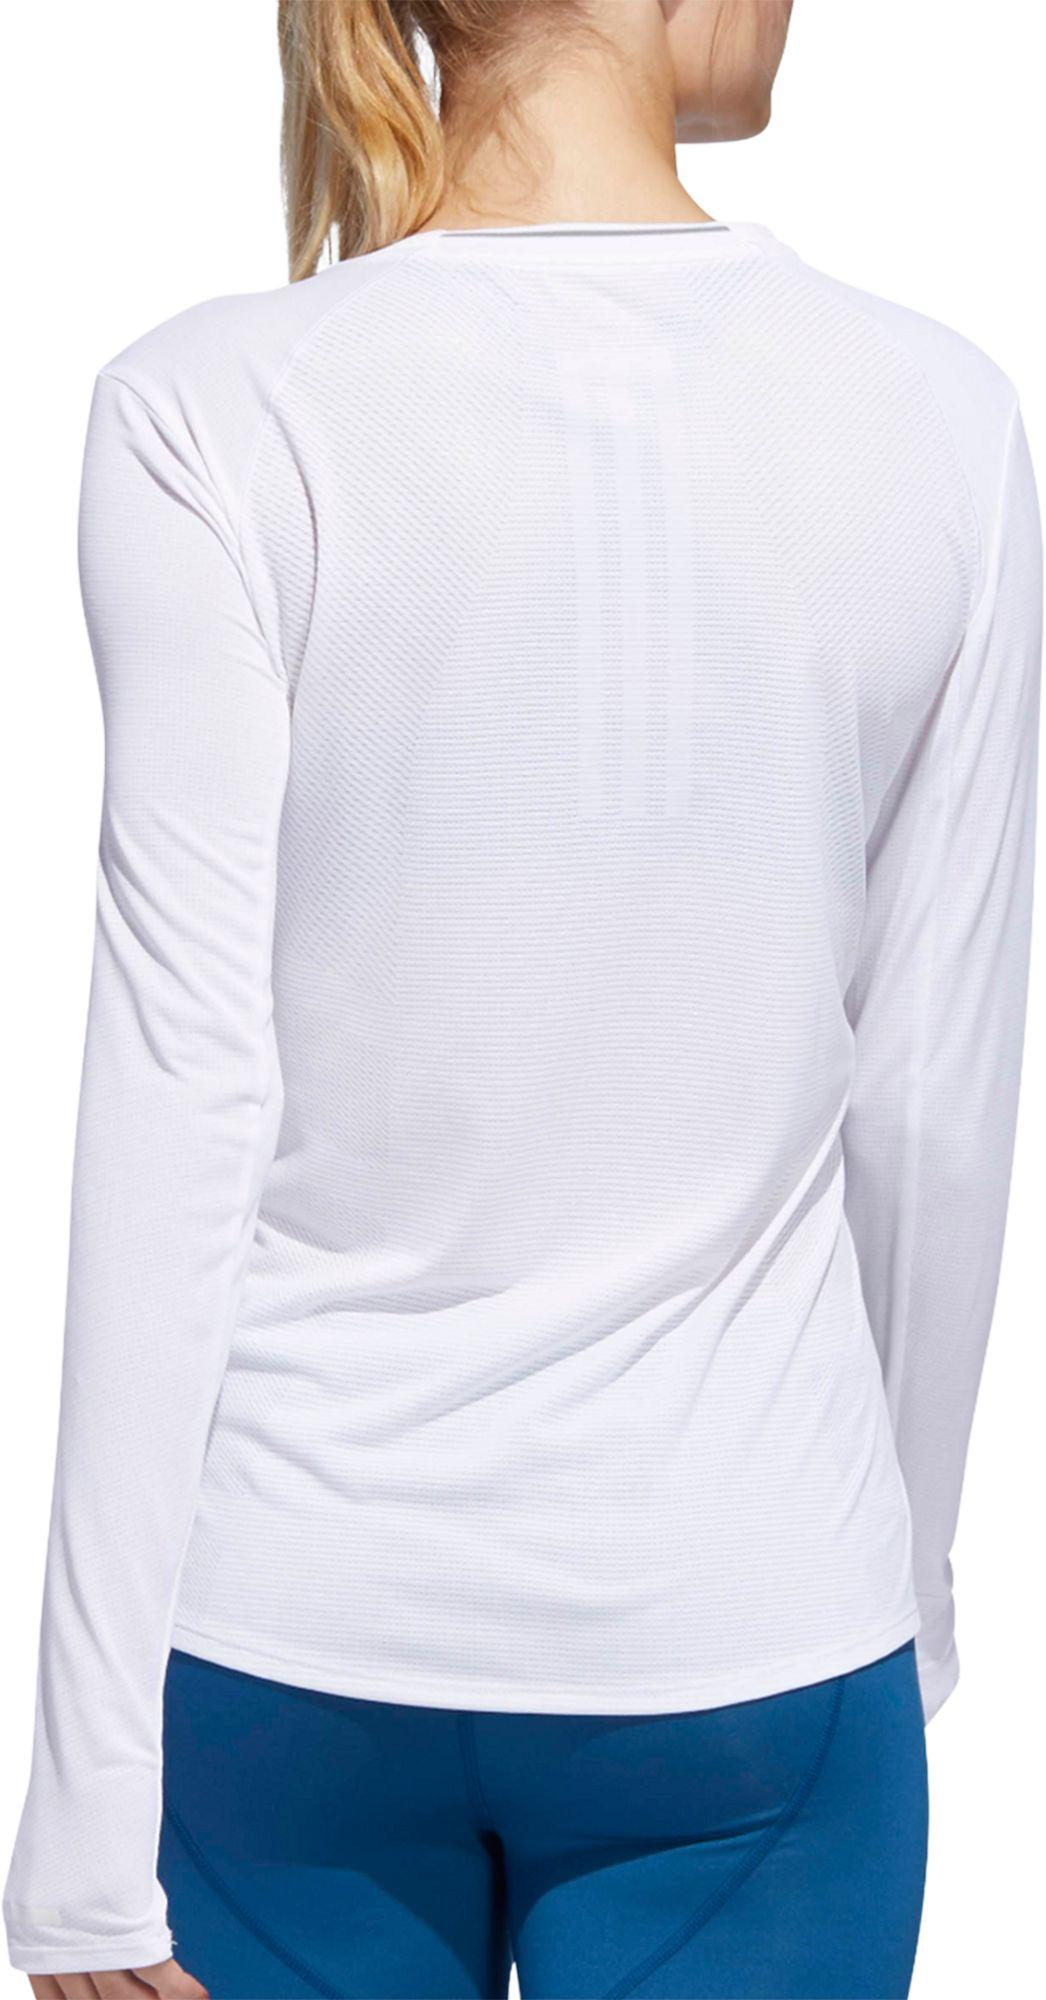 8147f5497ebc4 Adidas - White Supernova Running Long Sleeve Shirt - Lyst. View fullscreen